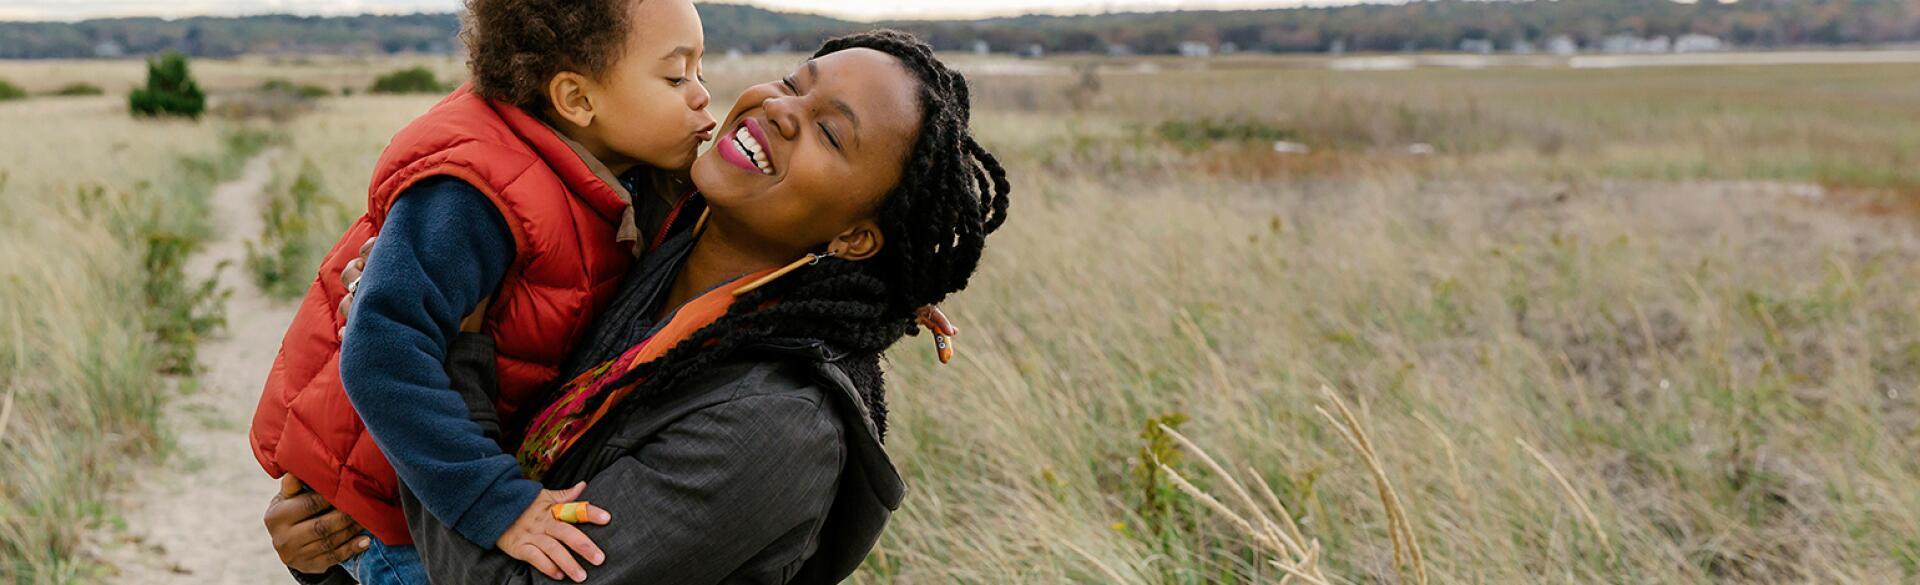 image_of_black_mother_holding_small_child_against_landscape_Stocksy_txpf9d9135aWFX200_OriginalDelivery_1284835_1540.jpg